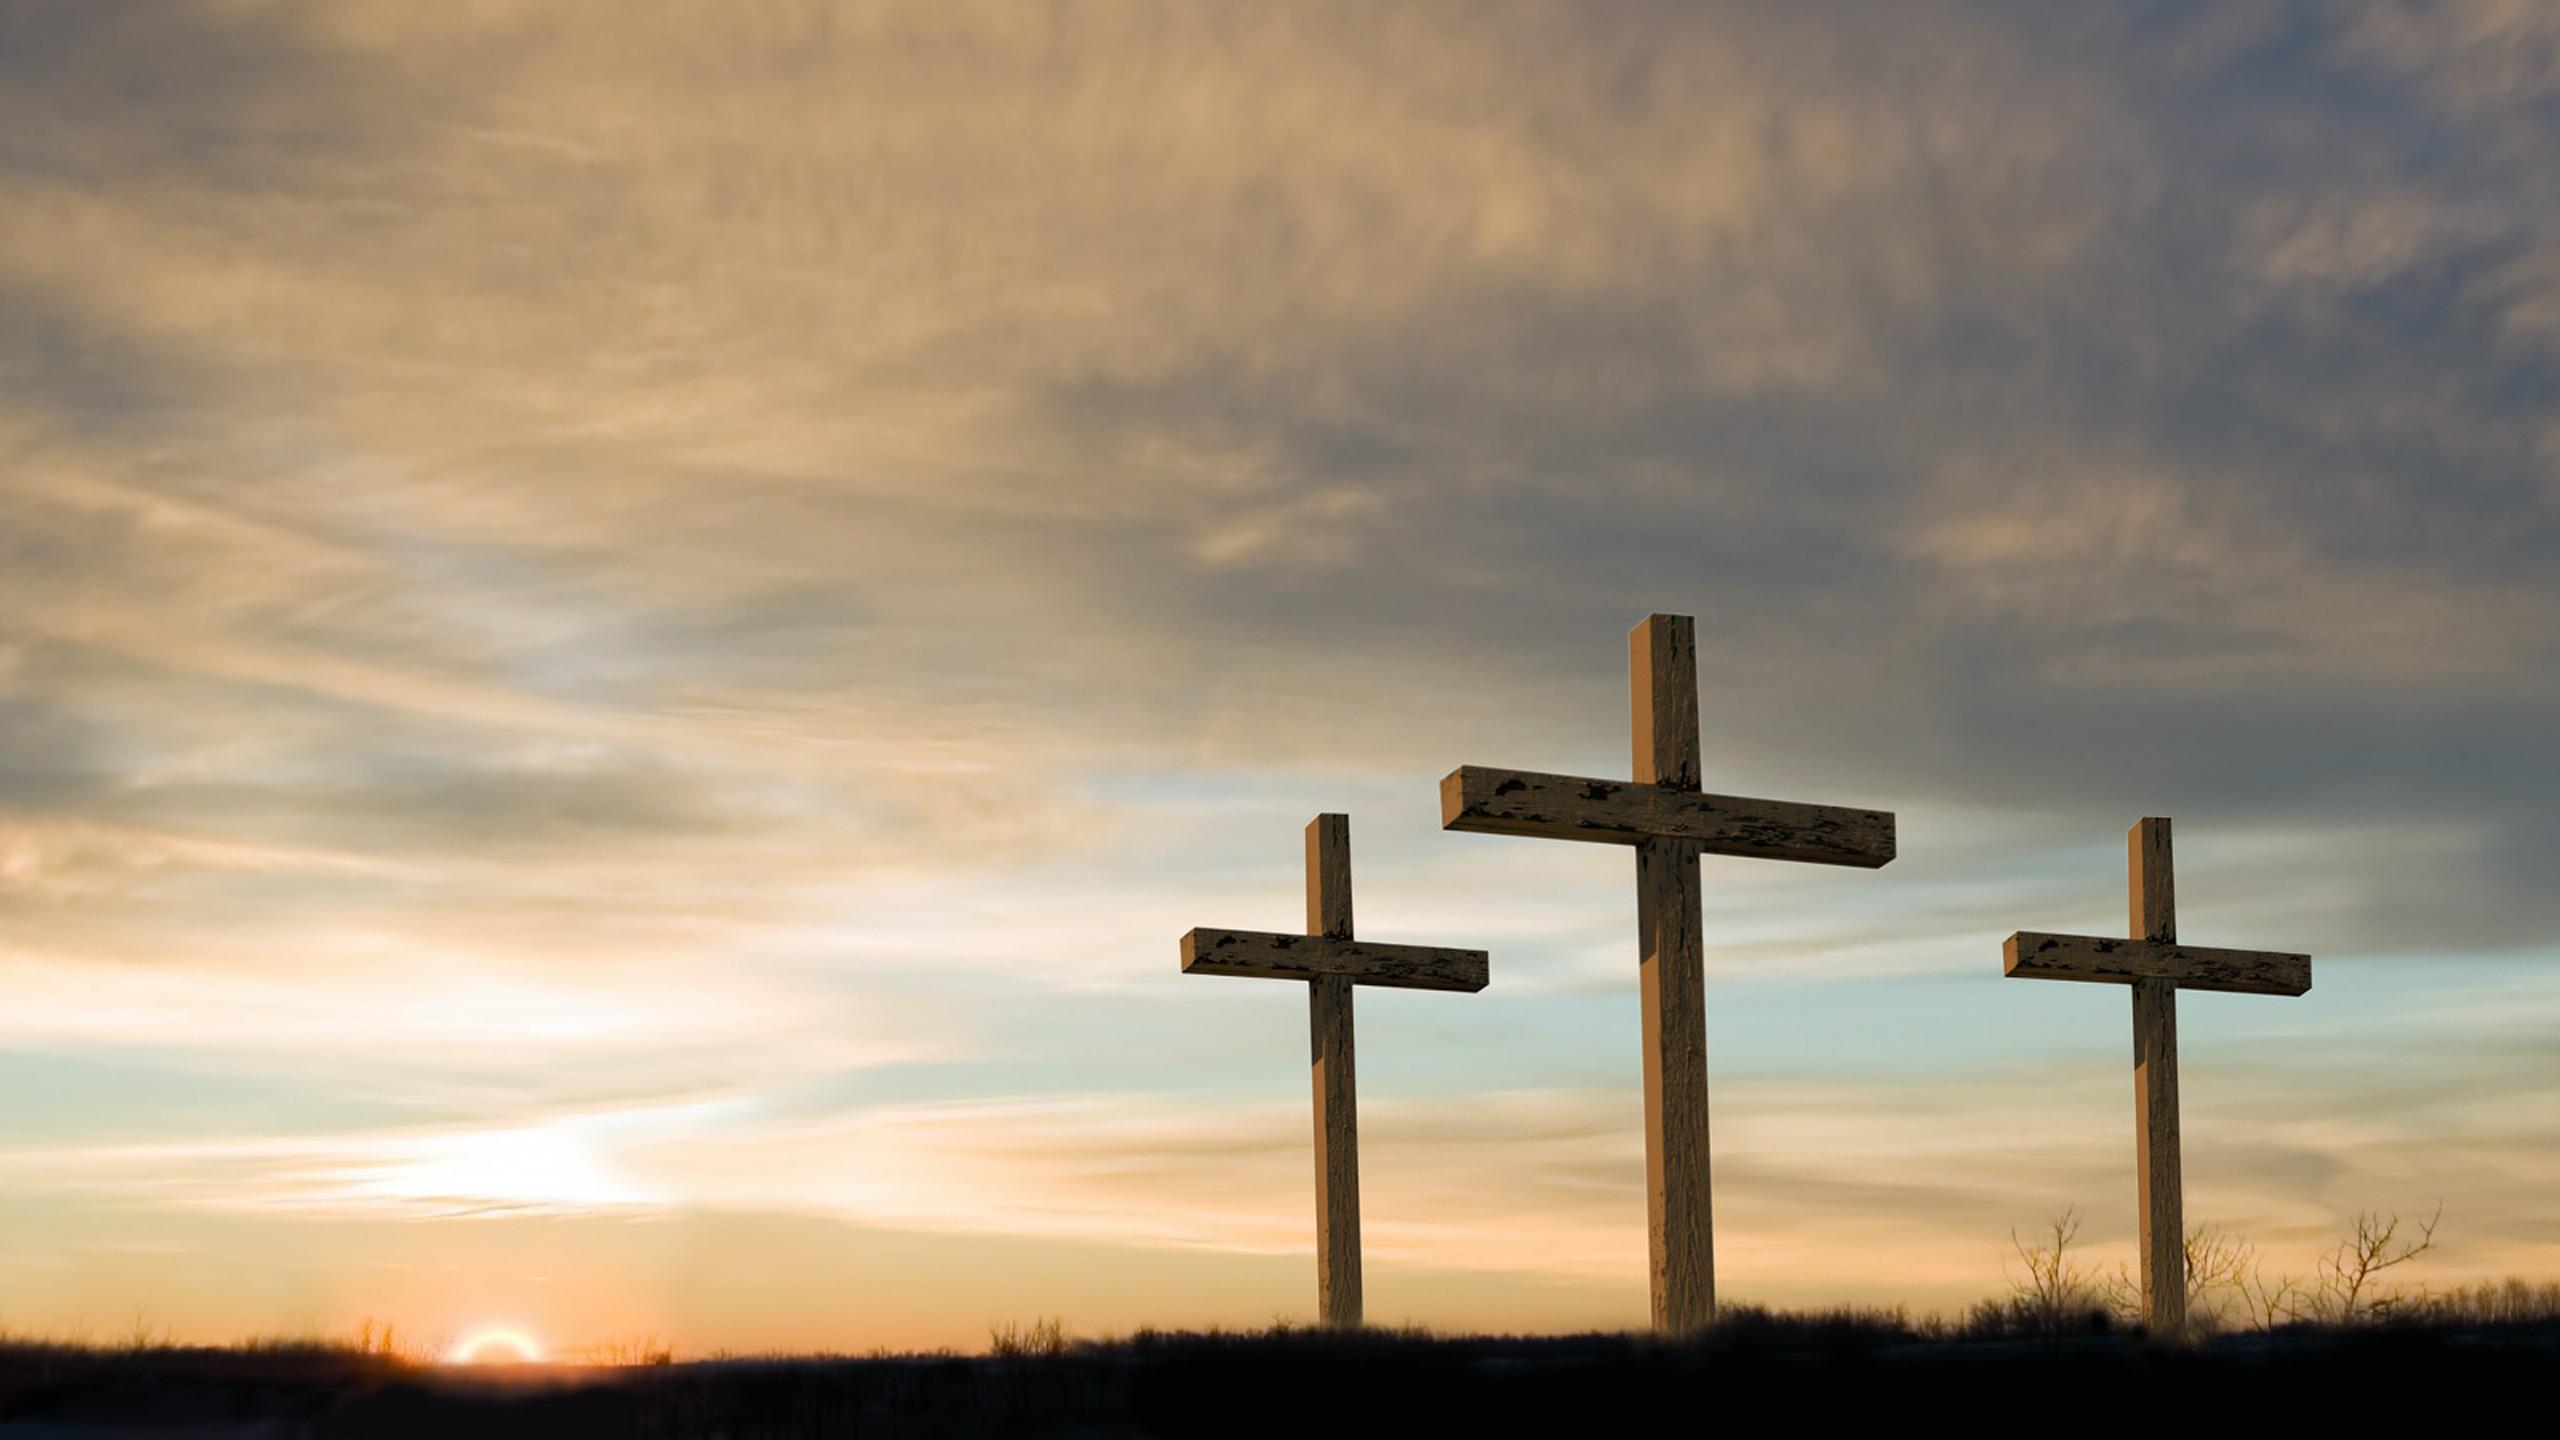 New Testament Christian Churches of America, Inc. - #NTCC #NTCCA #New Testament Christian Churches of America, Inc.